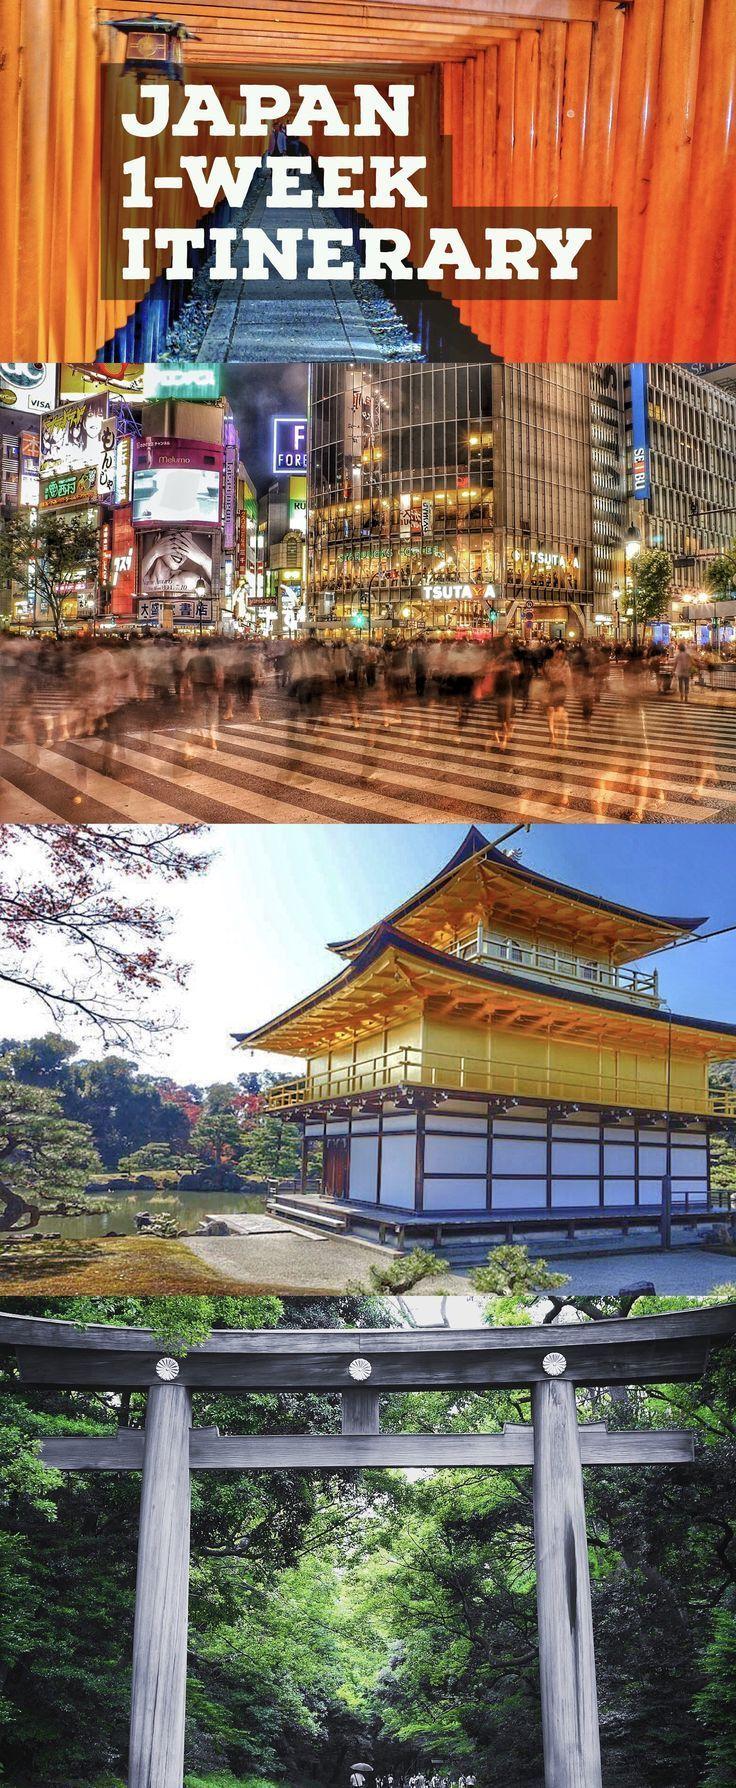 Explore the best of Japan travel guide in 1-week. See Tokyo, Kyoto, Osaka, Hiroshima, Nara, Hakone and more